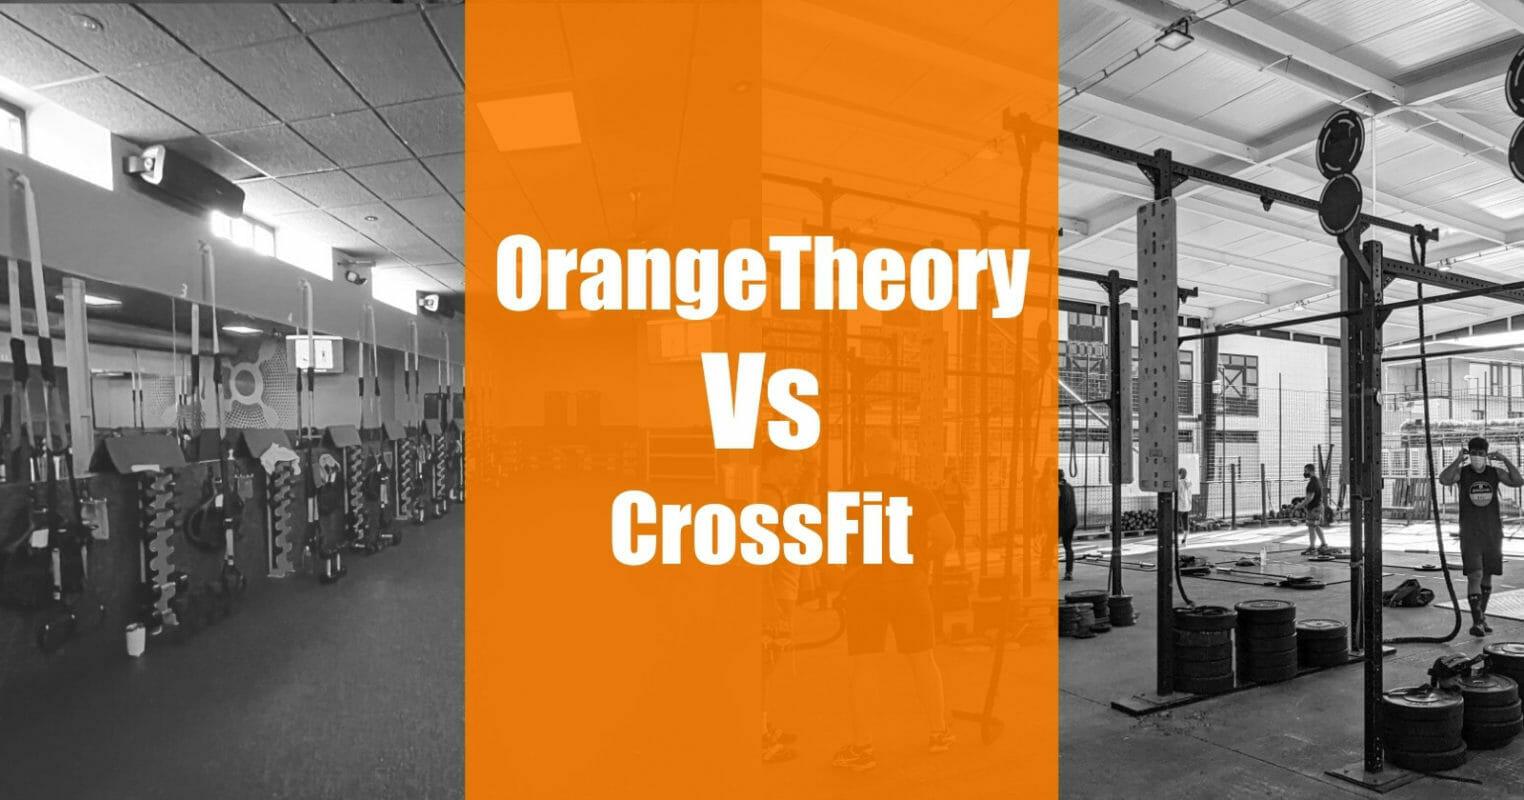 crossfit vs orangetheory